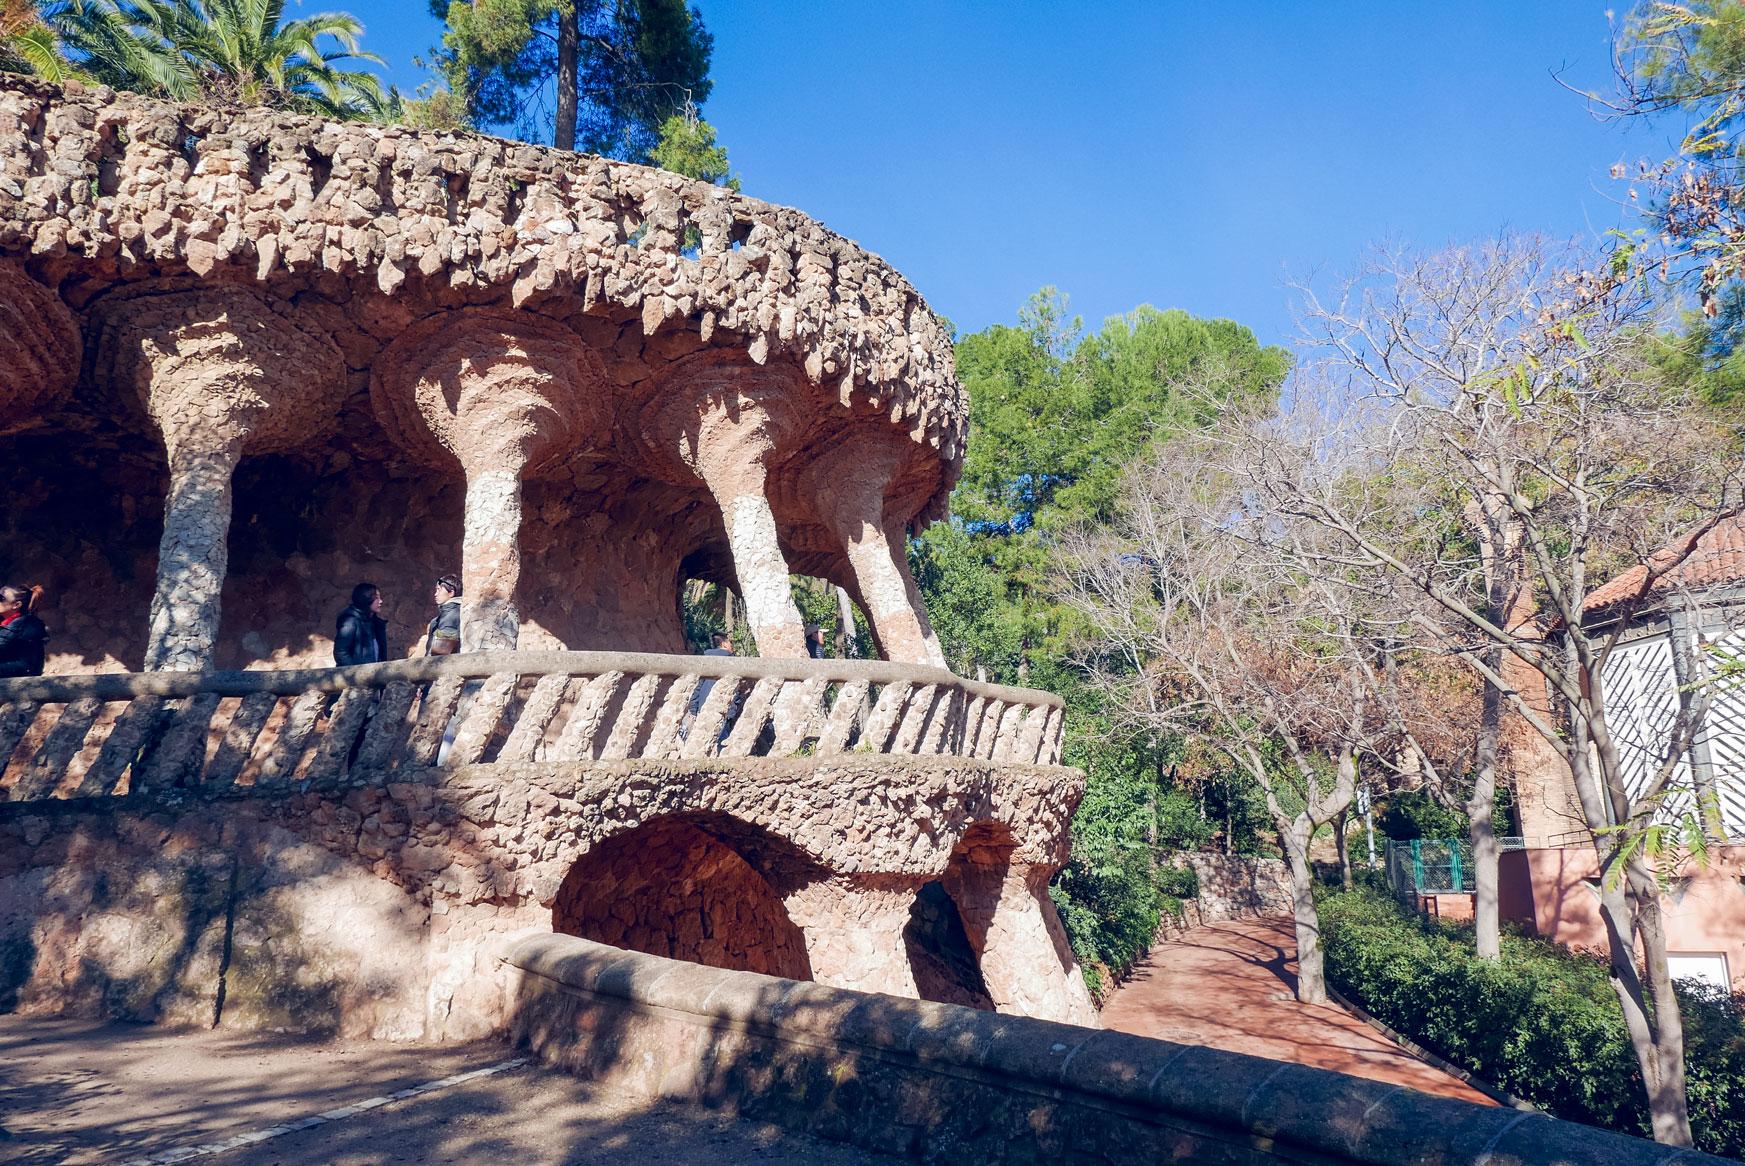 Spain Barcelona Parc Guell gaudi